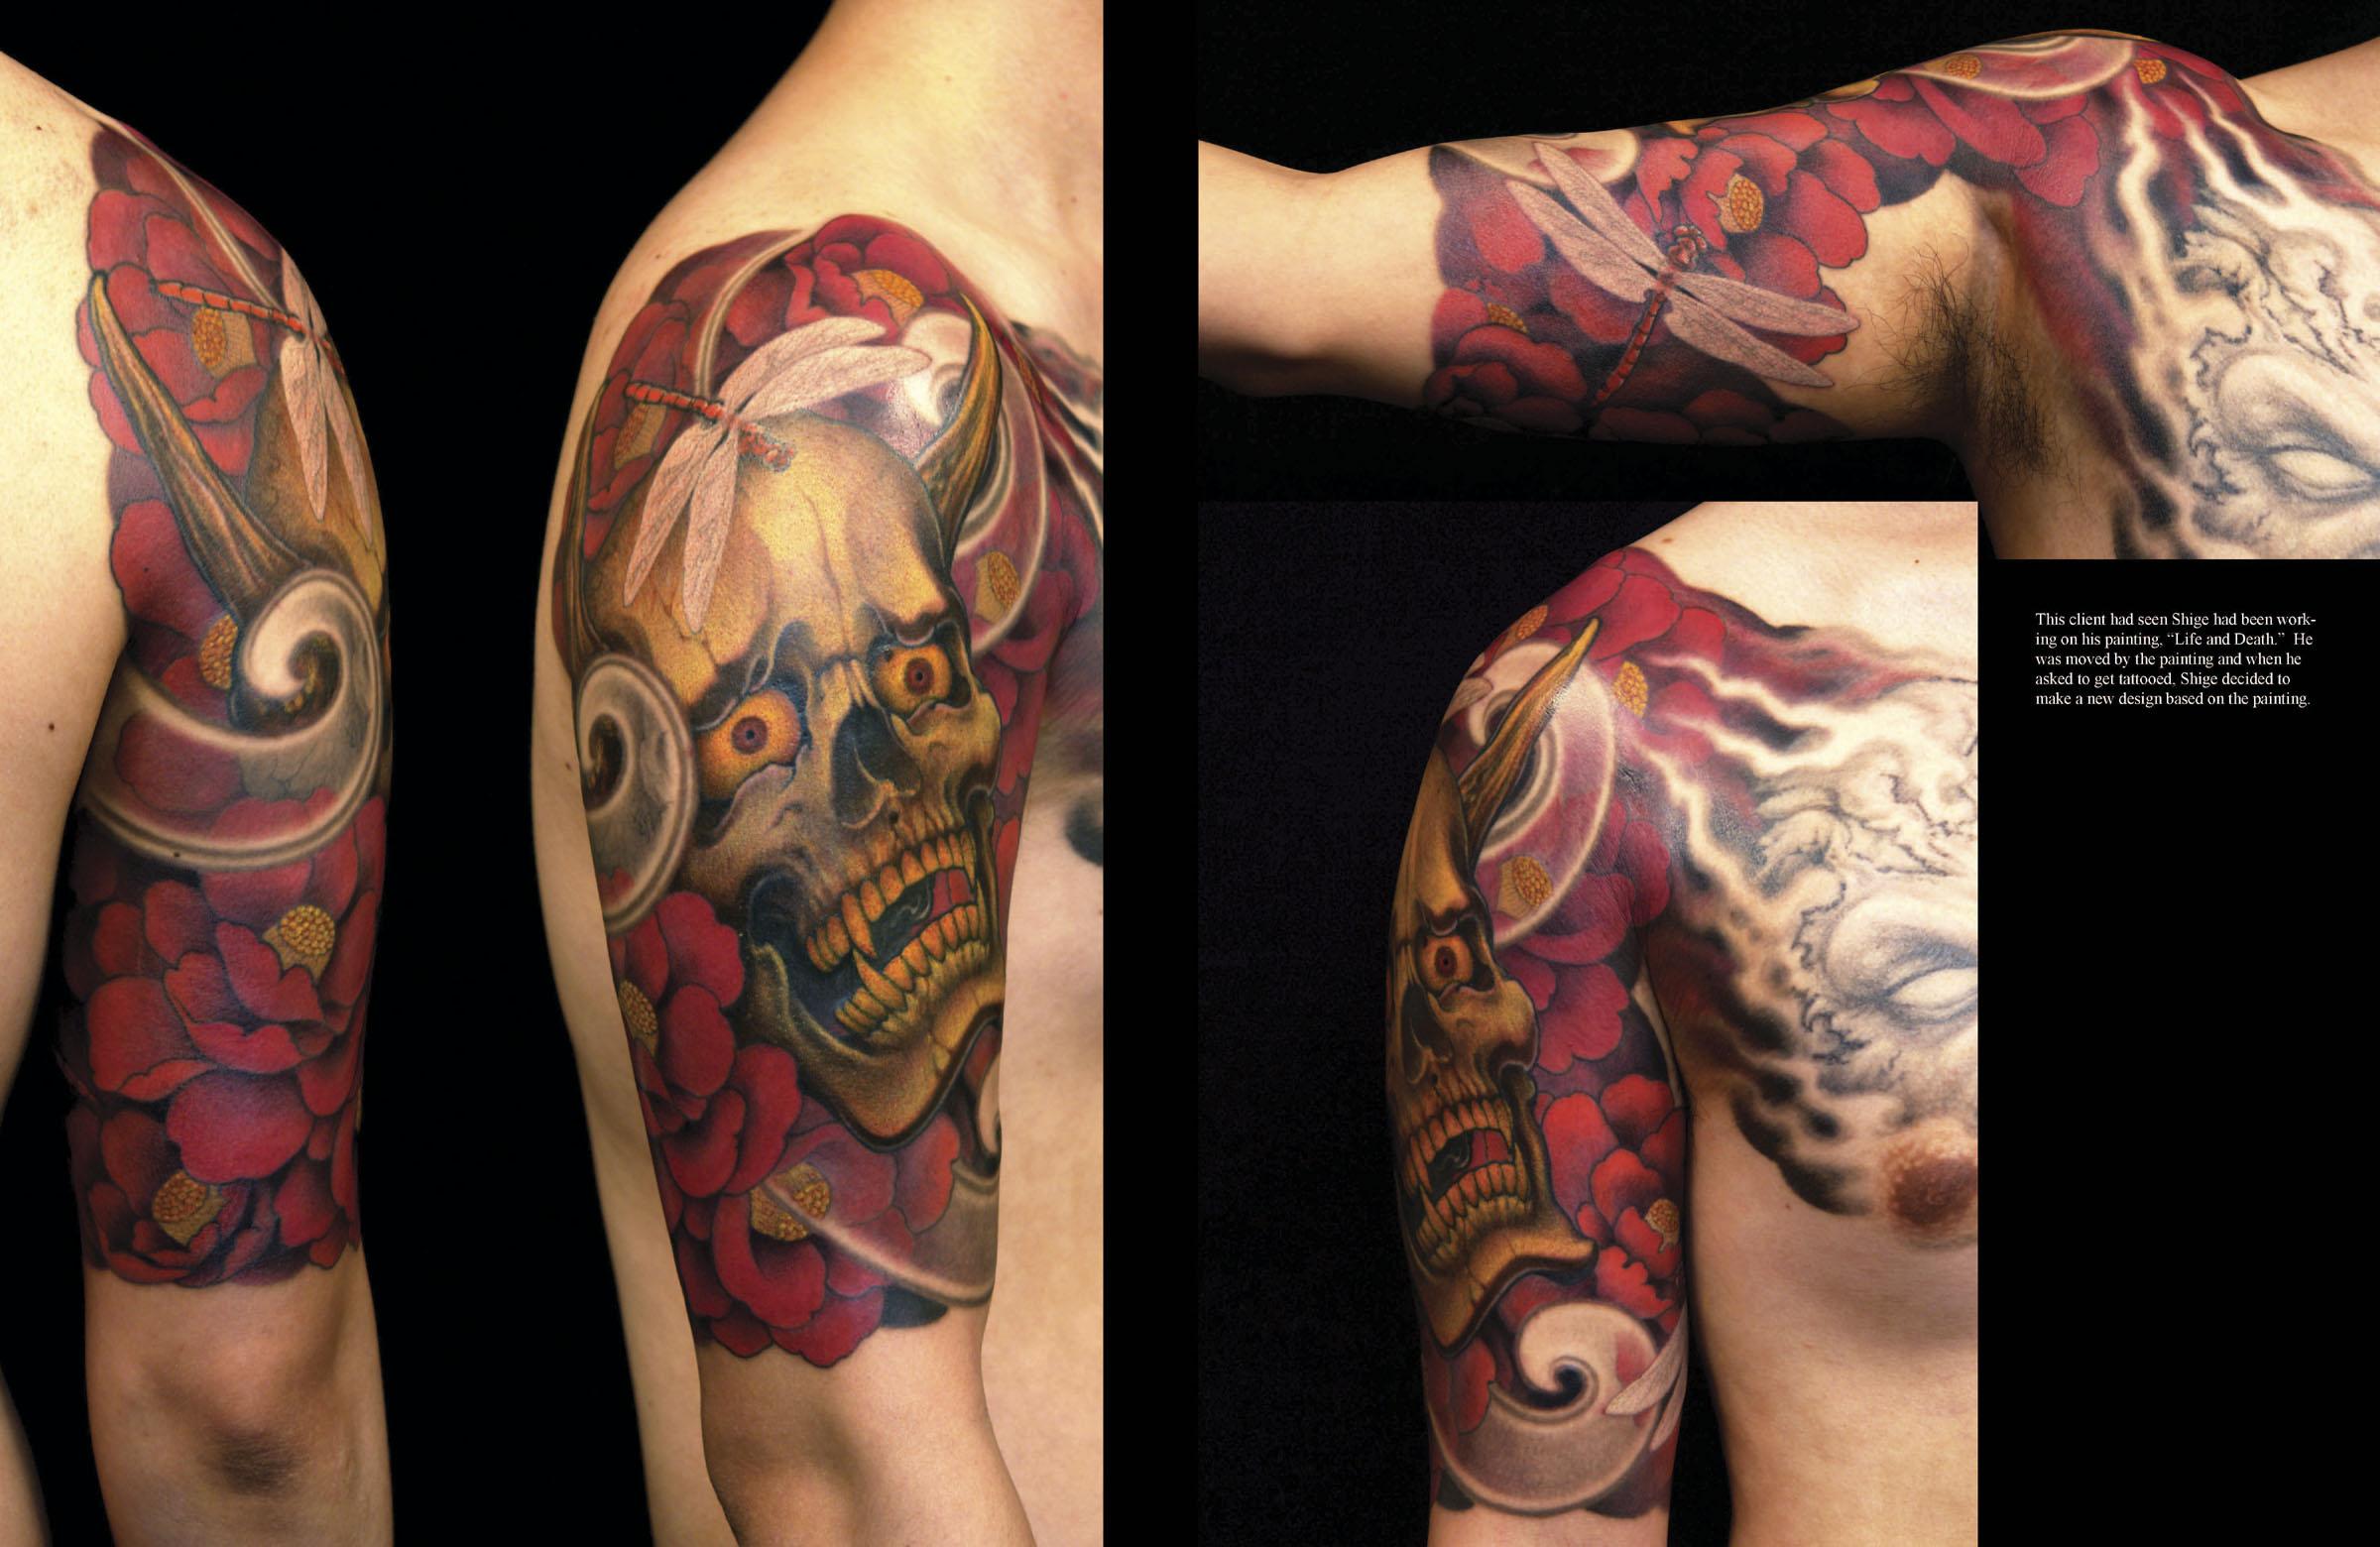 Grime Tattoo Artist >> JUST A TASTE | Baxter's Blog